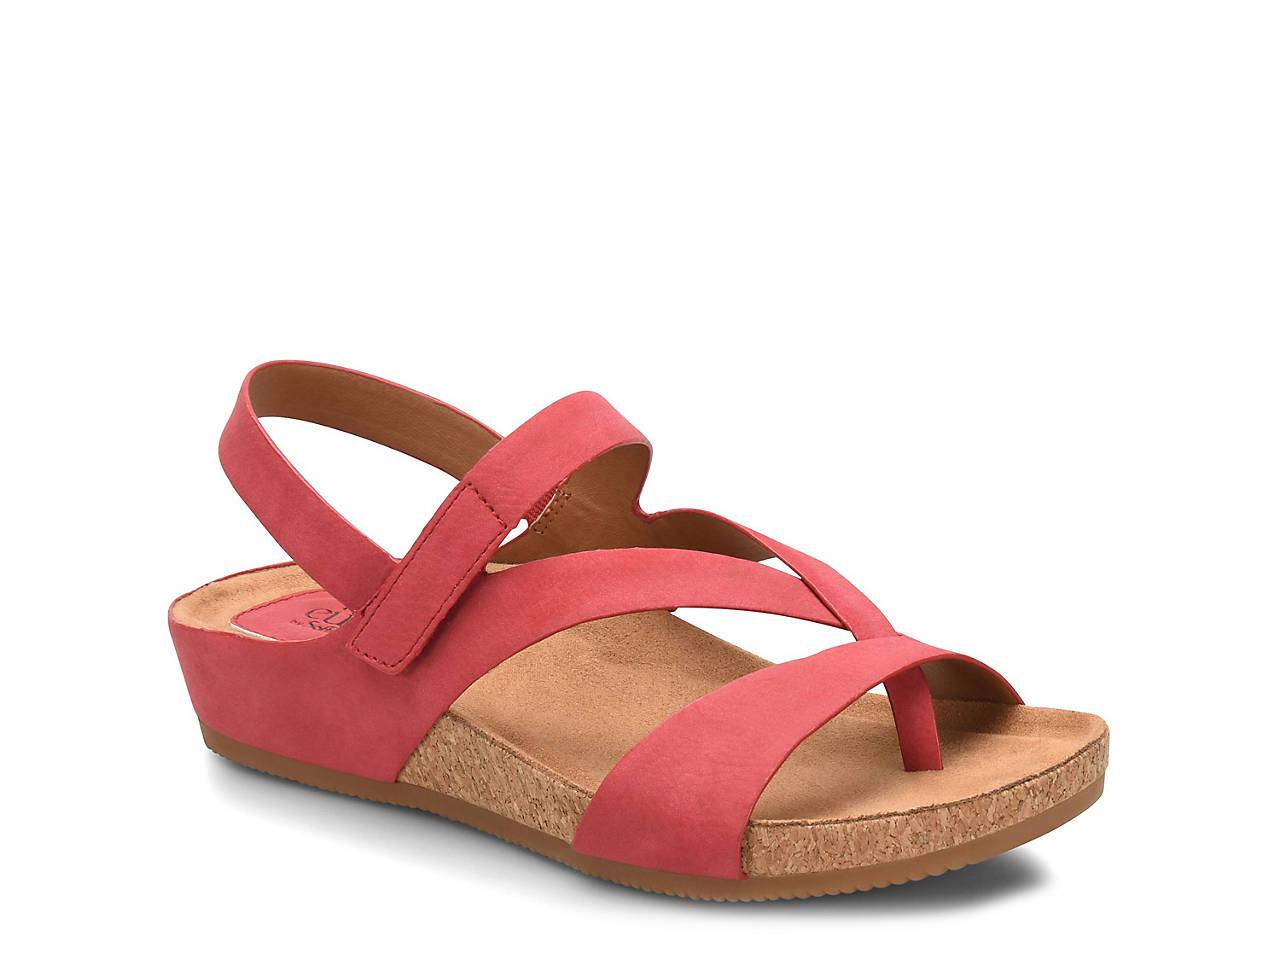 911a9f78fba2 Eurosoft Gianetta Wedge Sandal Women s Shoes